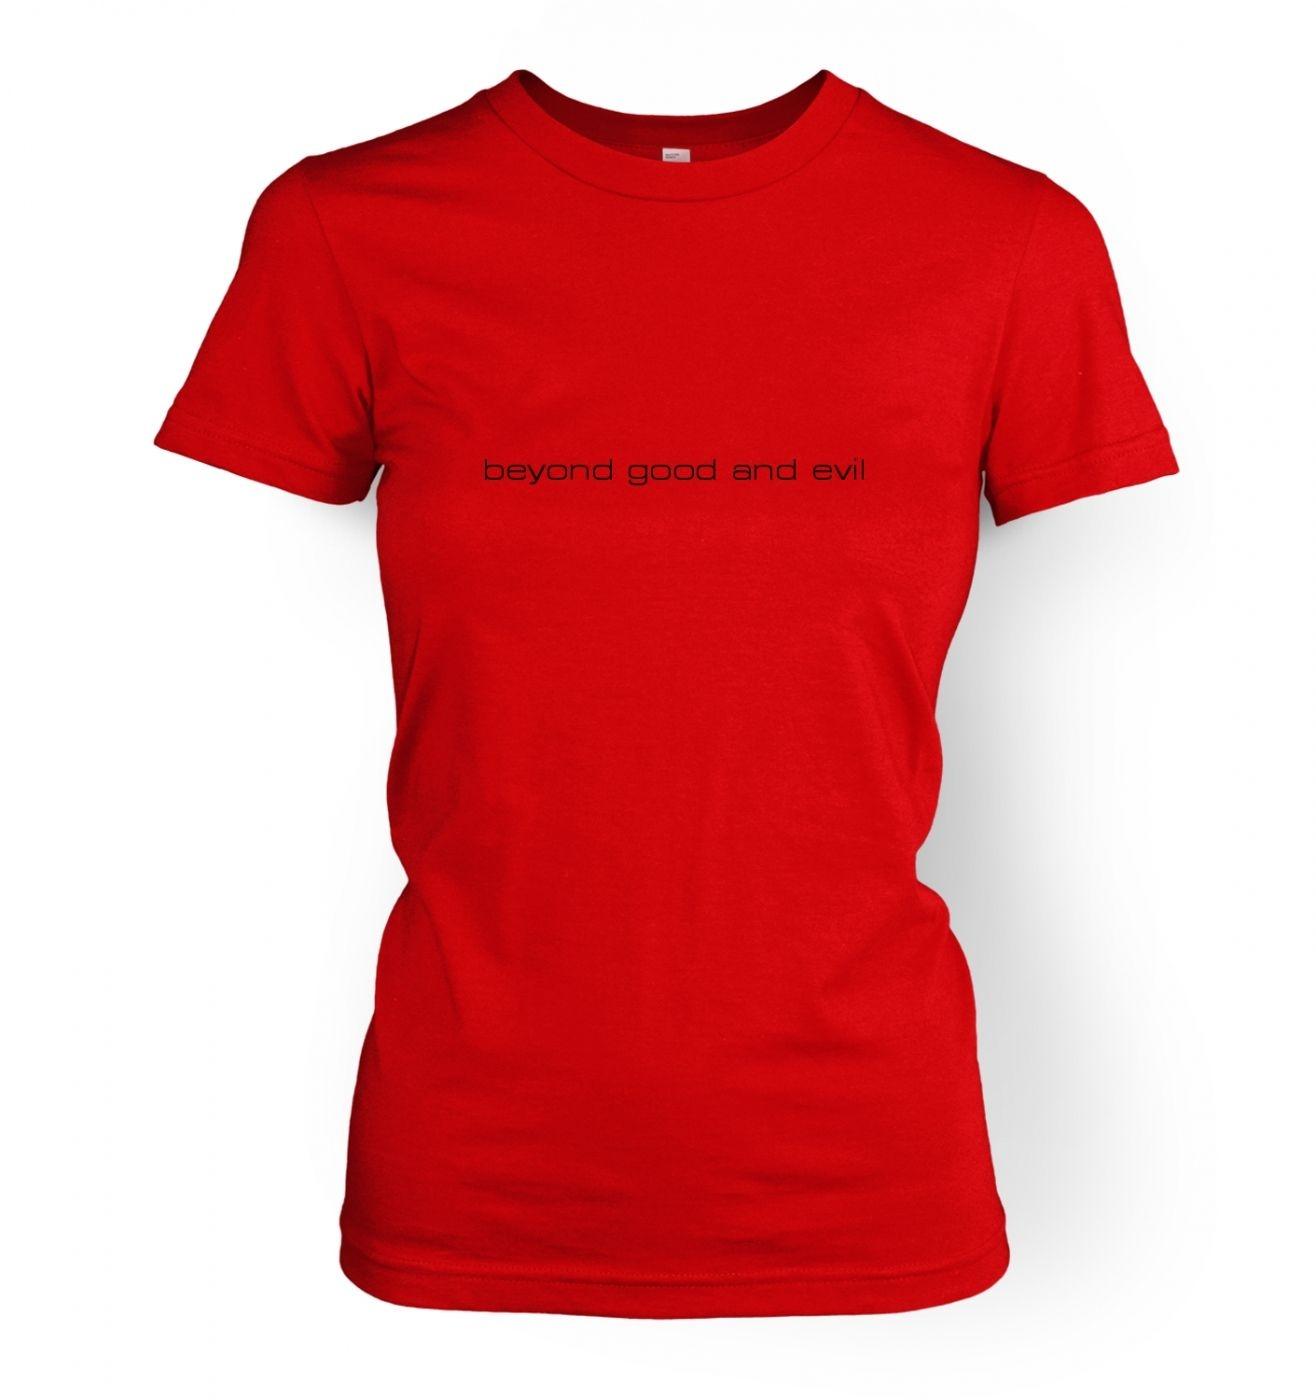 beyond good and evil women's tshirt